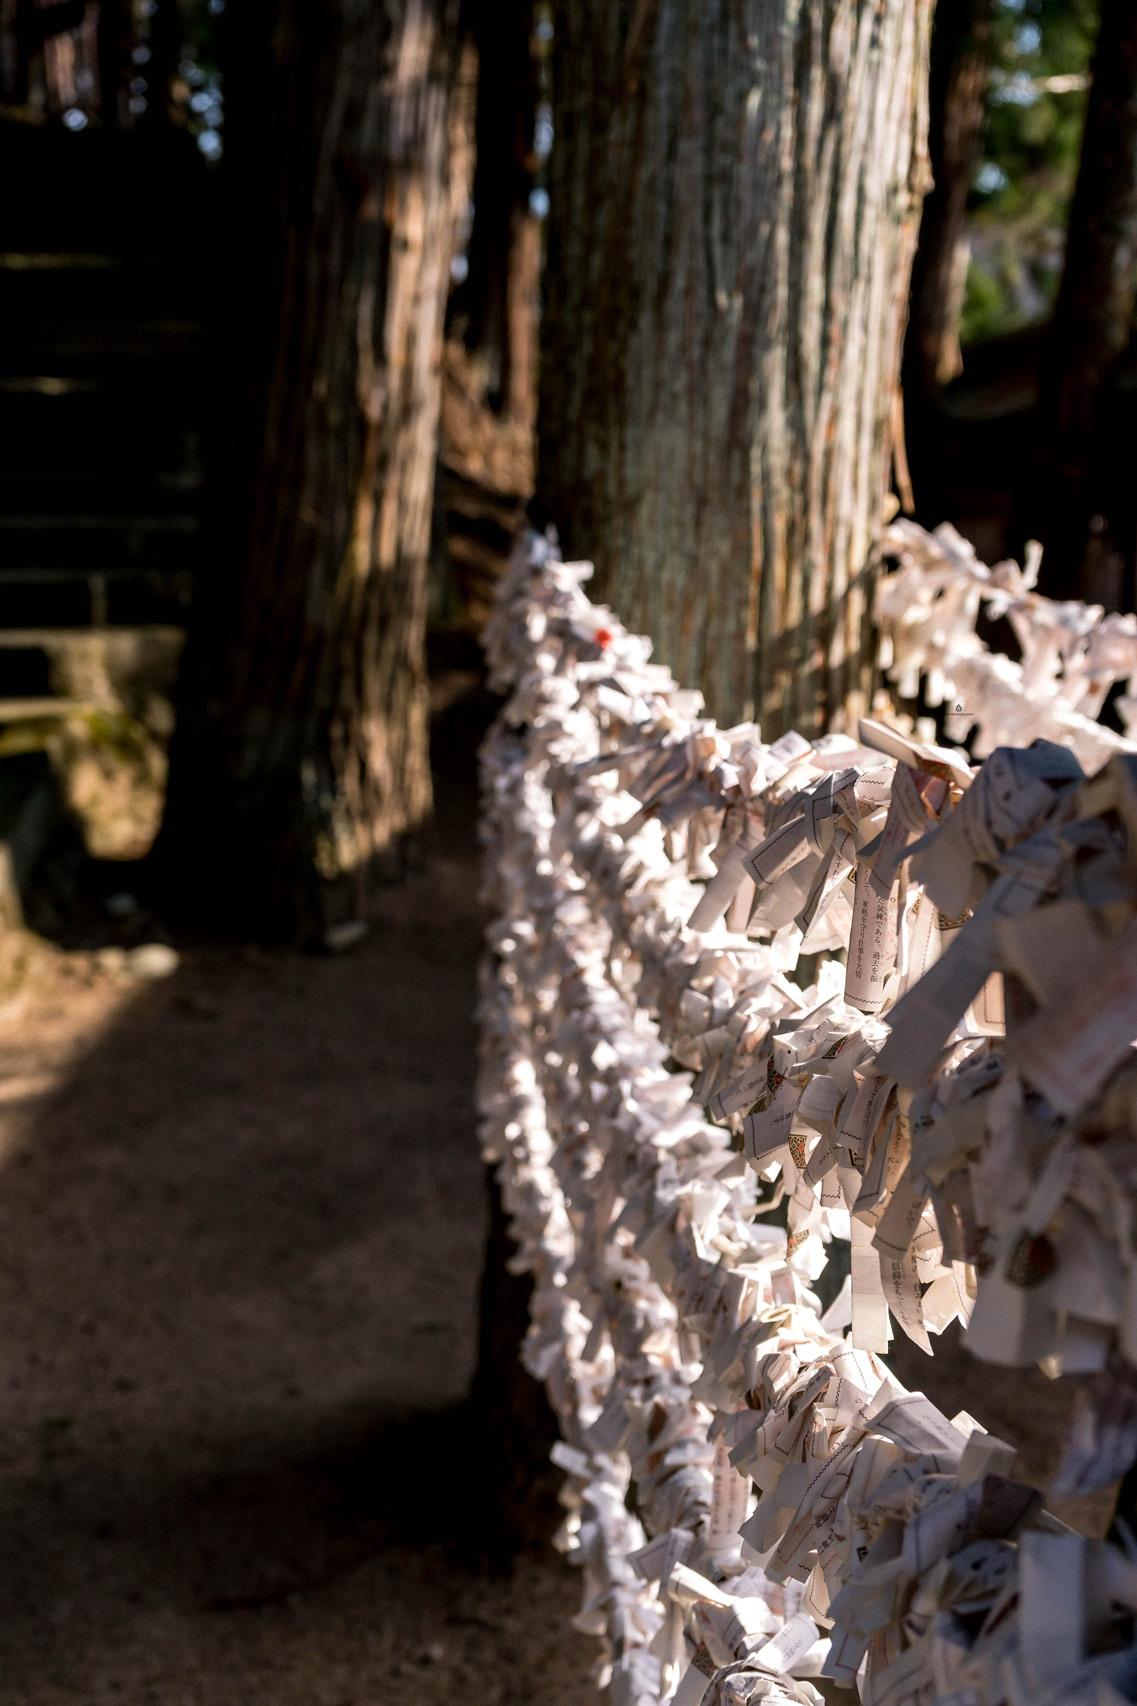 Omikuji fortunes at Sakurayama Hachimangu shrine, Takayama